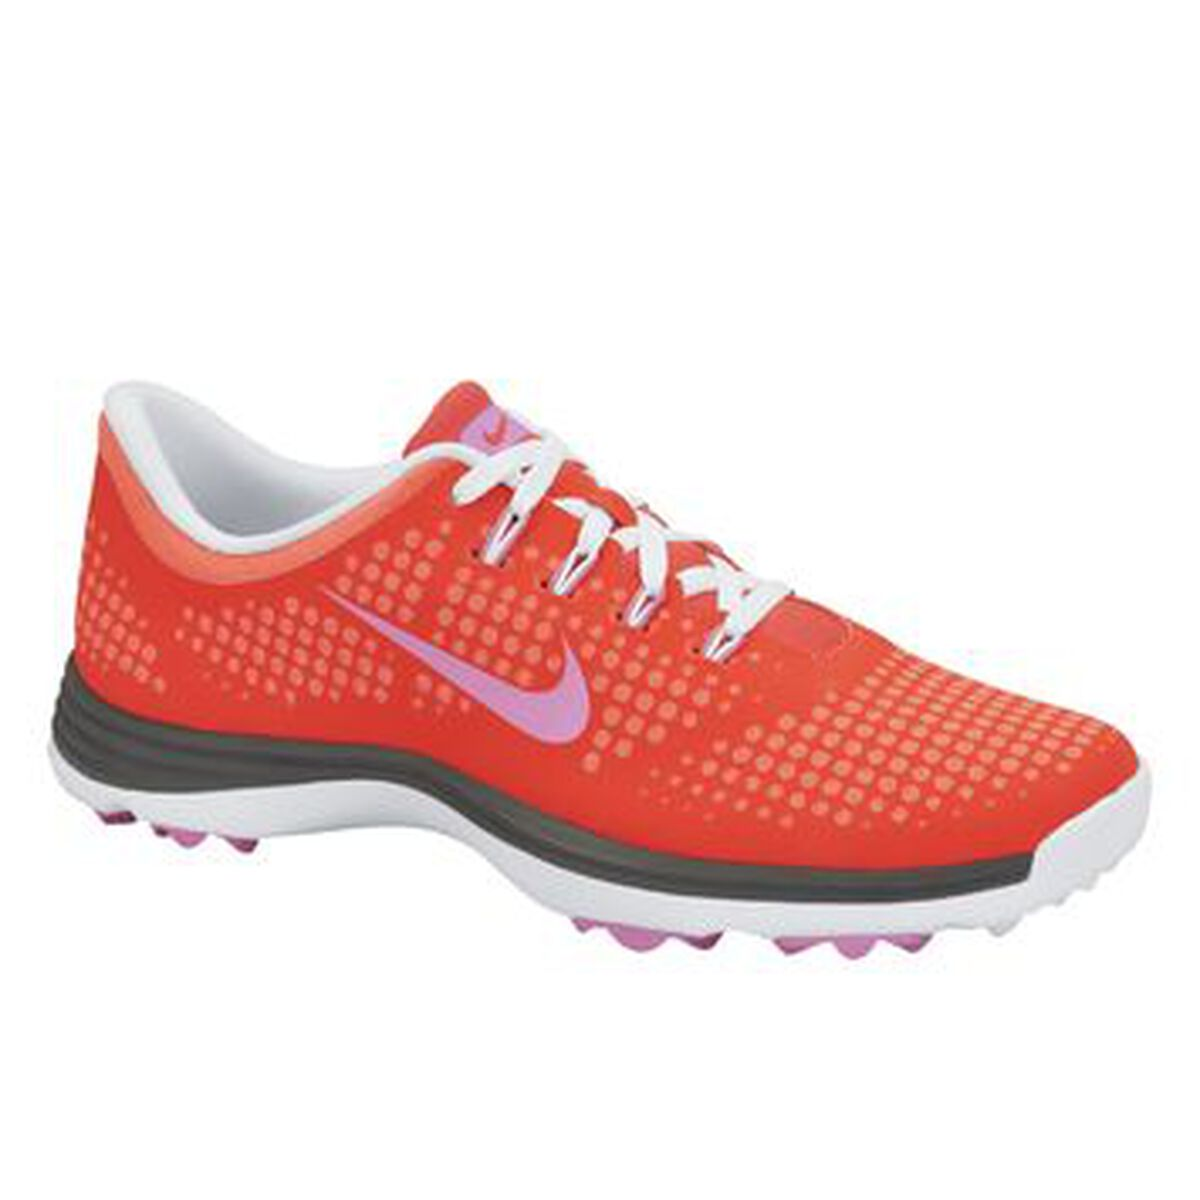 Lunar Empress Women s Golf Shoe by Nike  Shop Quality Nike Women s ... ab6975f89e2a